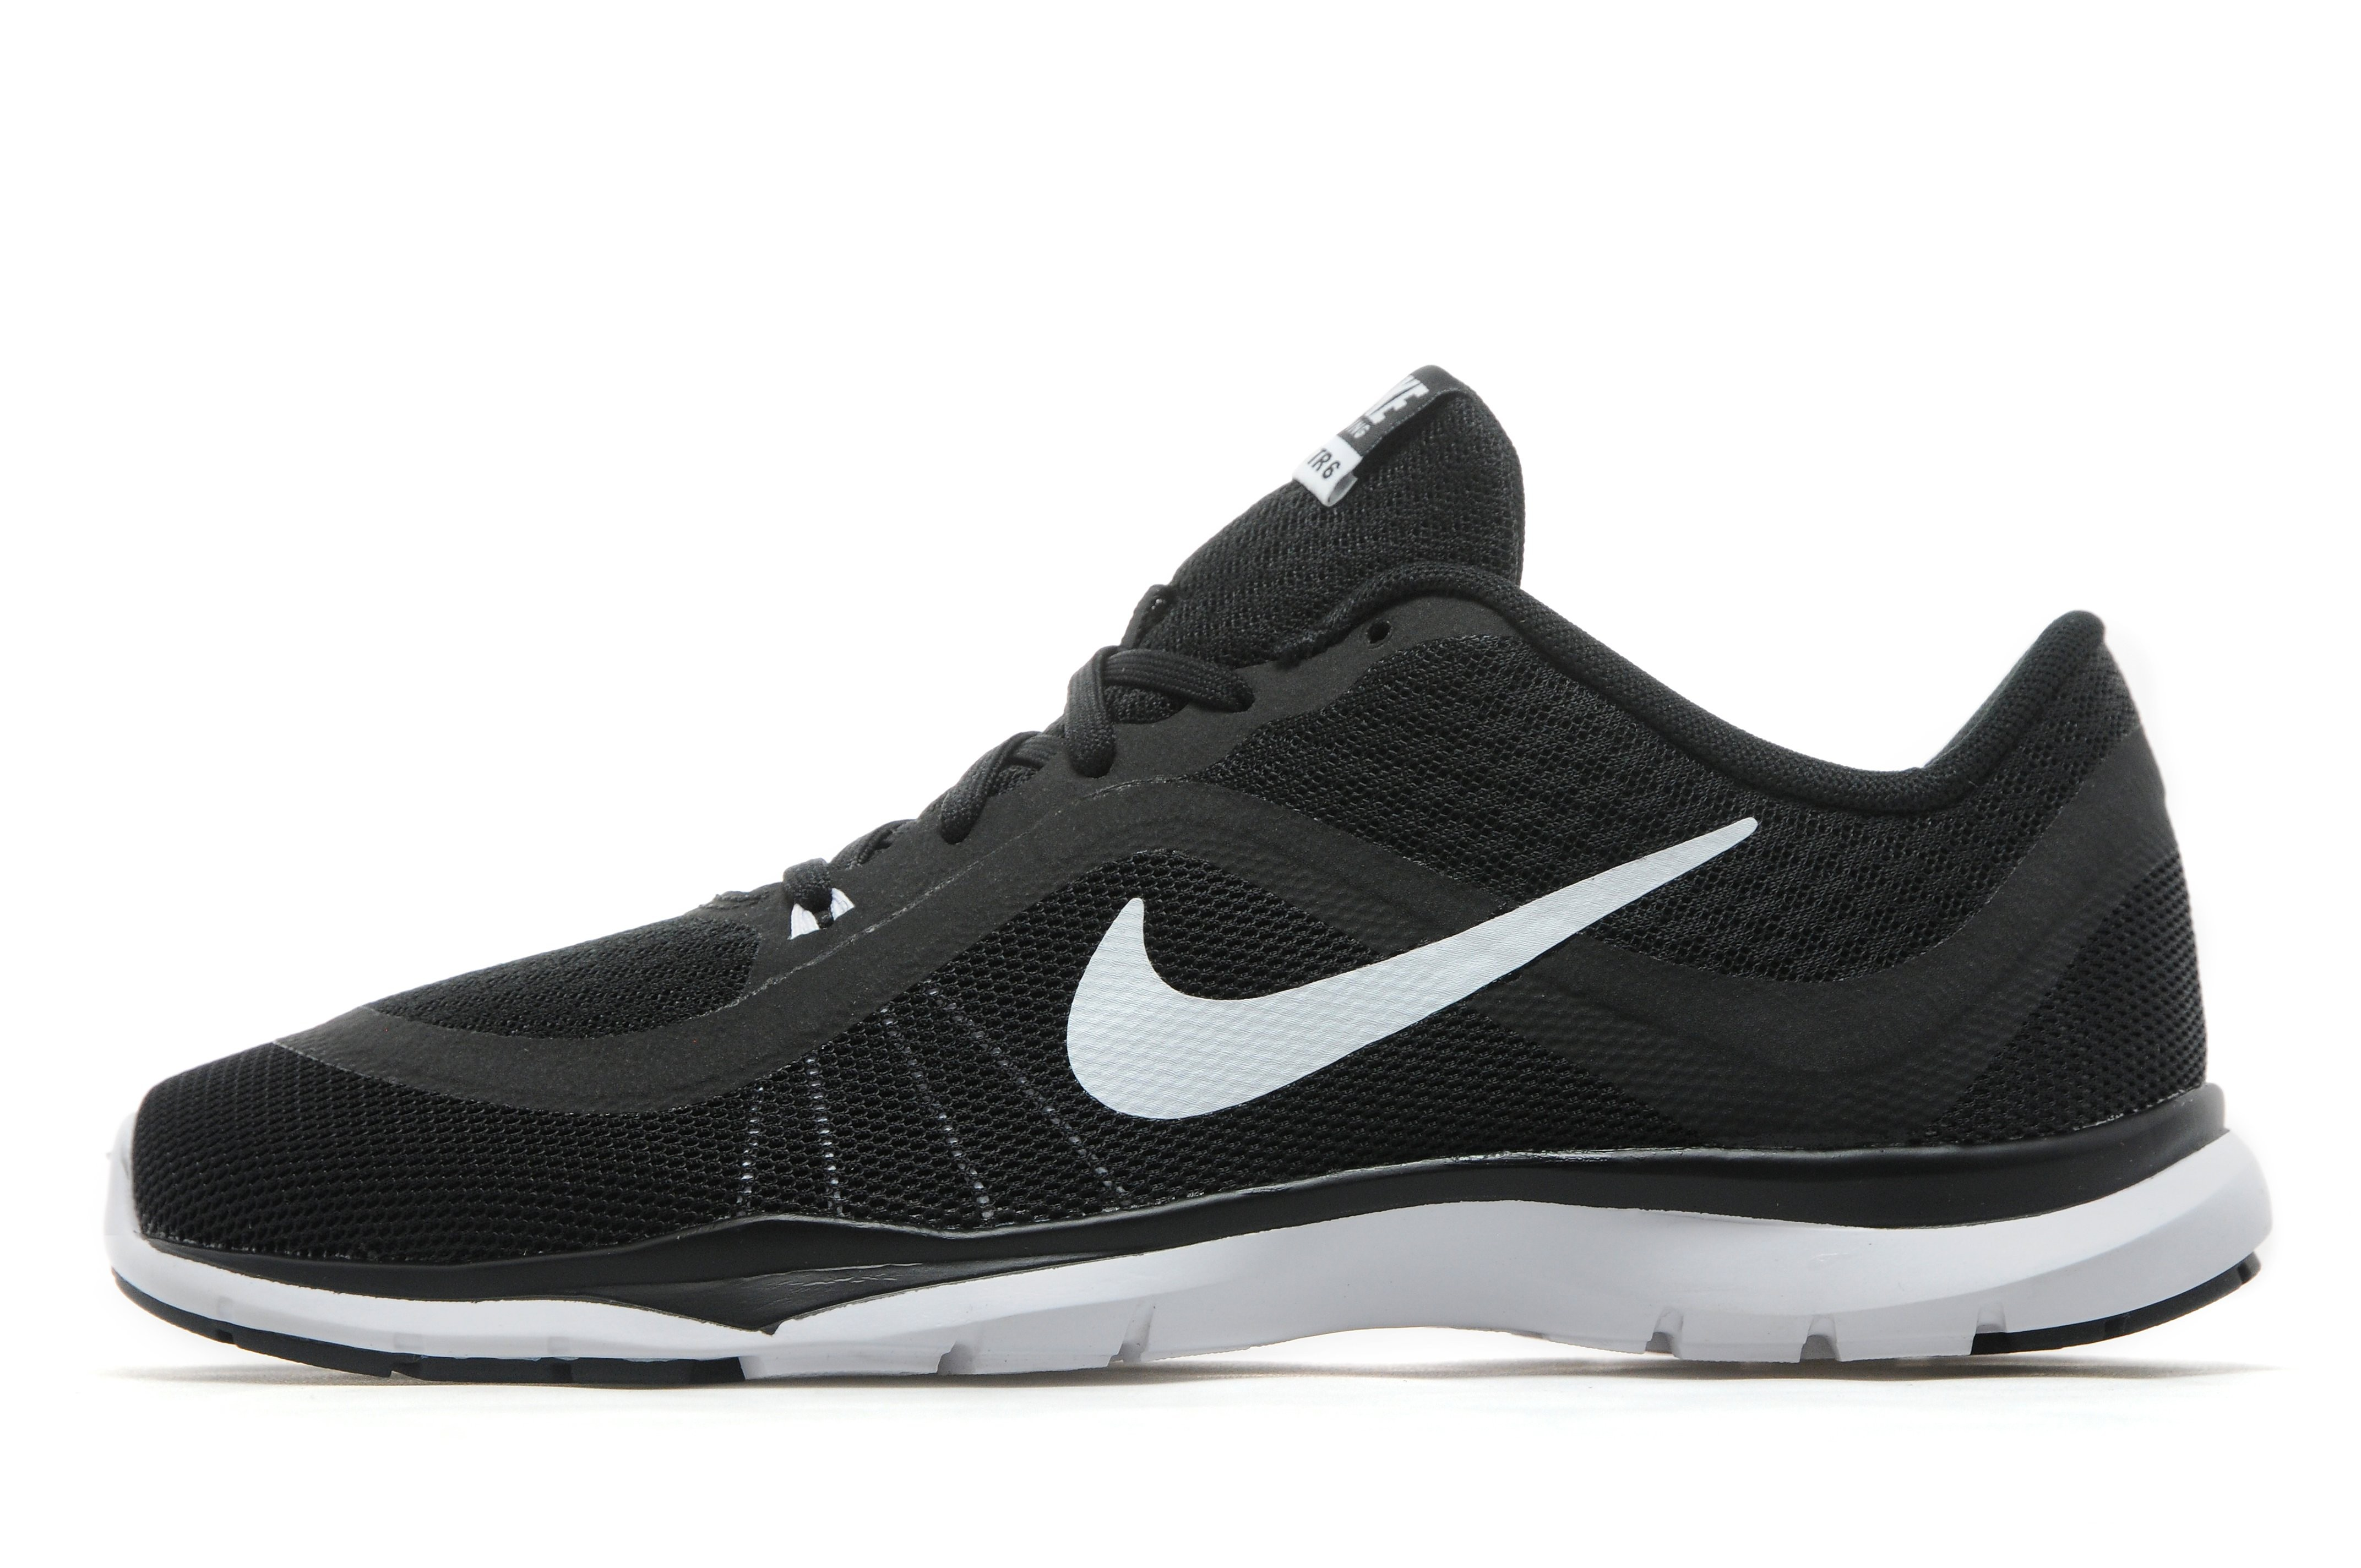 Nike FreeTR 6 Femme